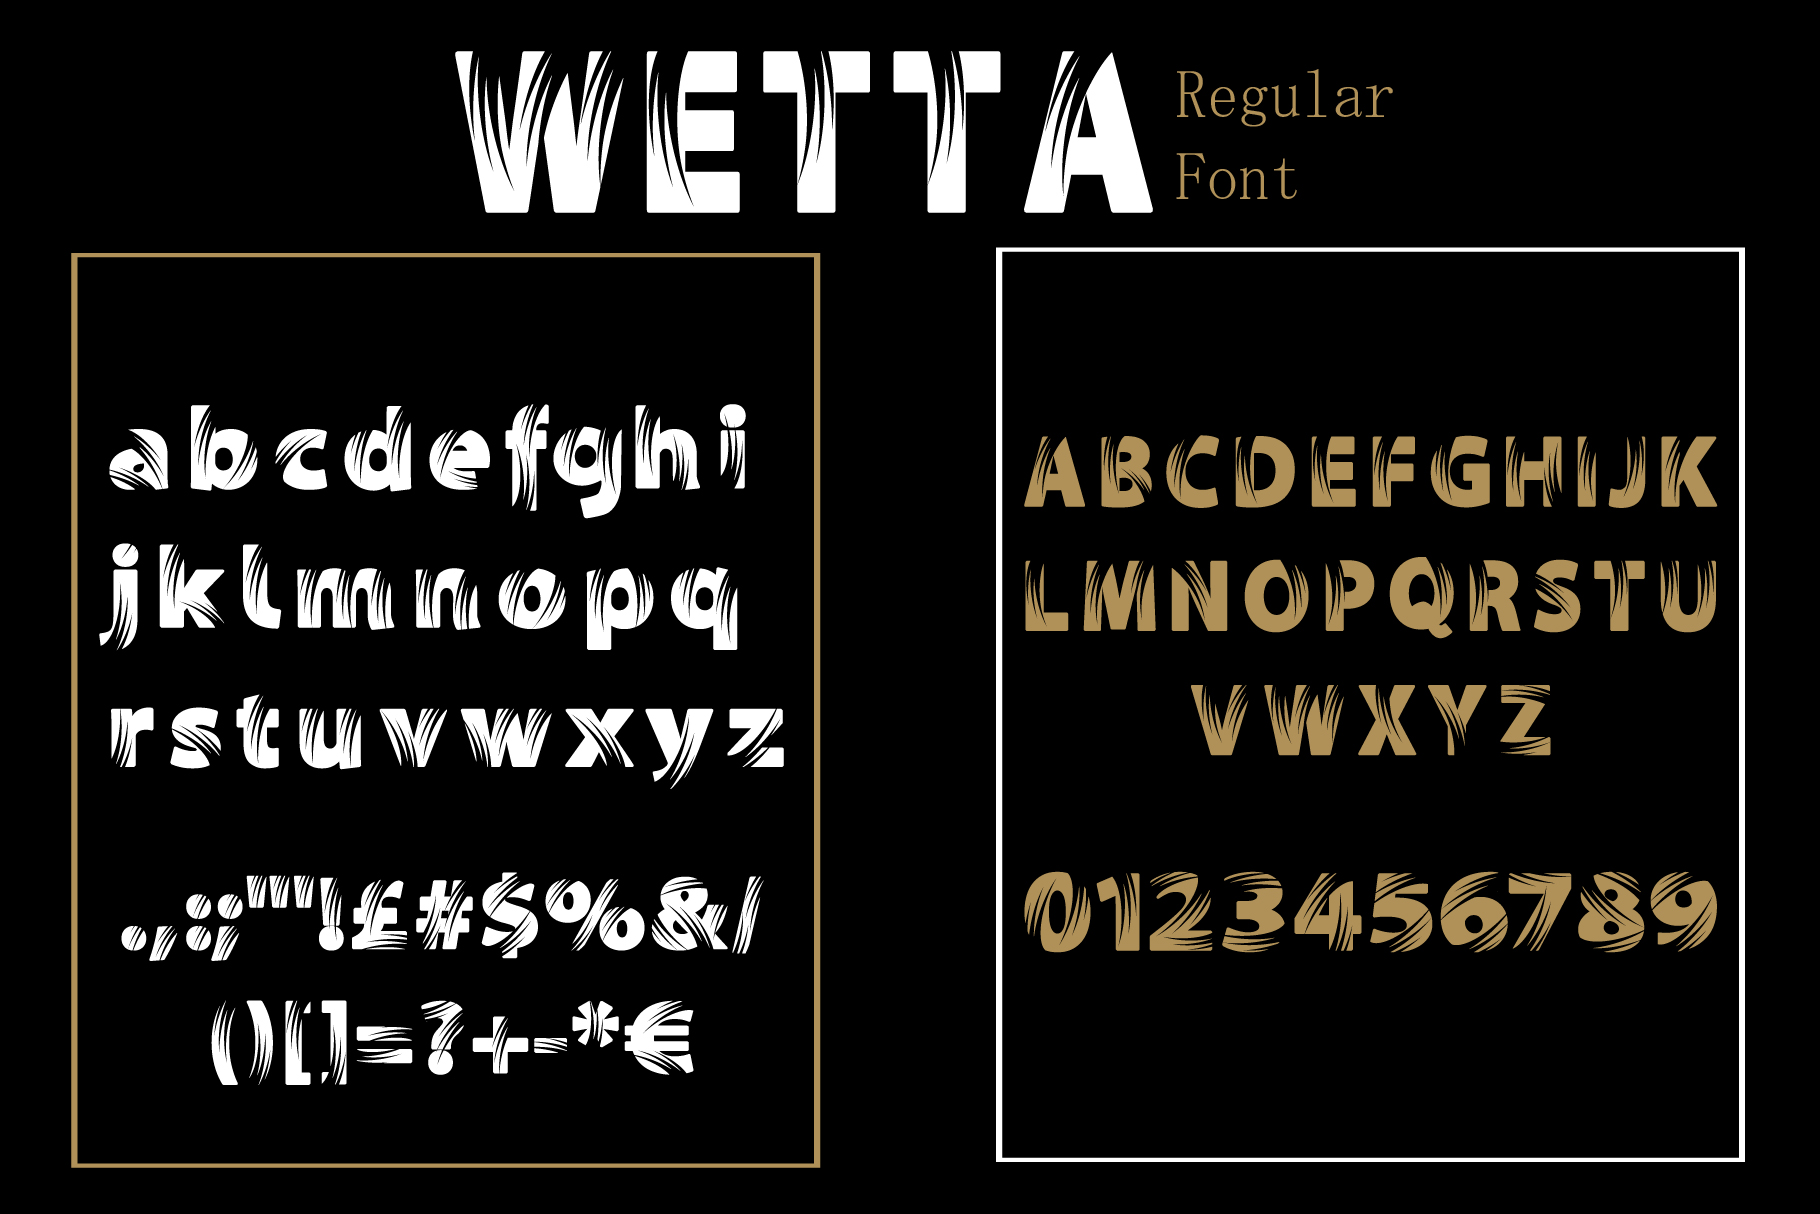 Wetta Regular Font example image 8